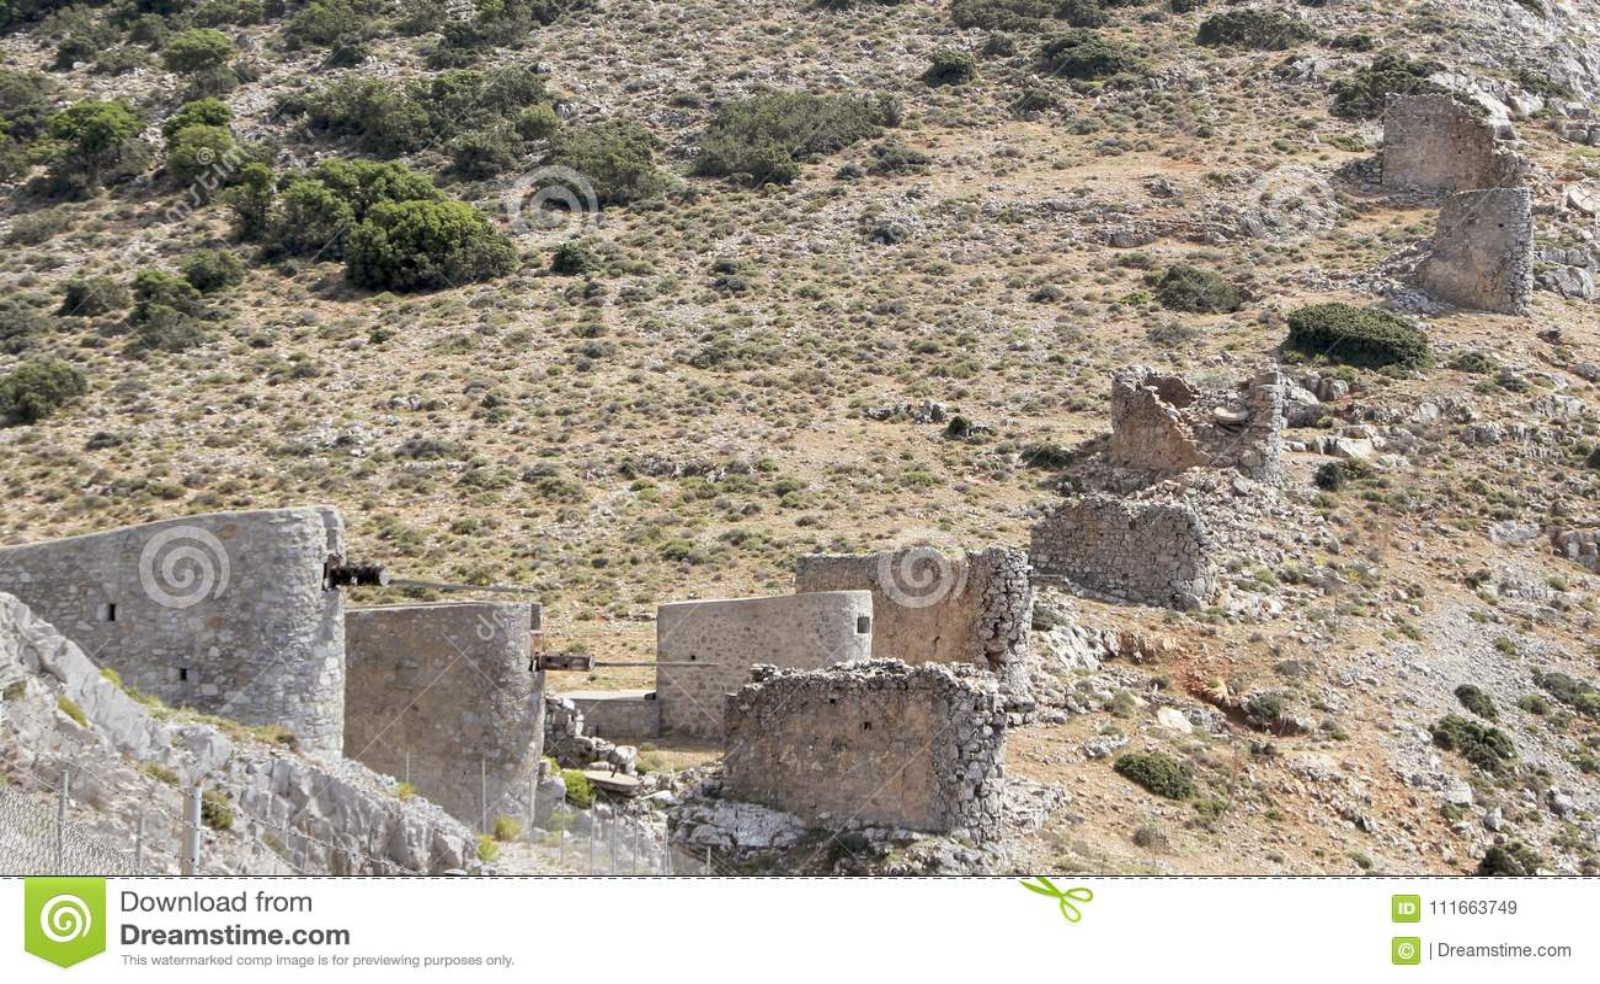 Ruins of ancient Venetian windmills built in 15th century, Lassithi Plateau, Crete, Greece